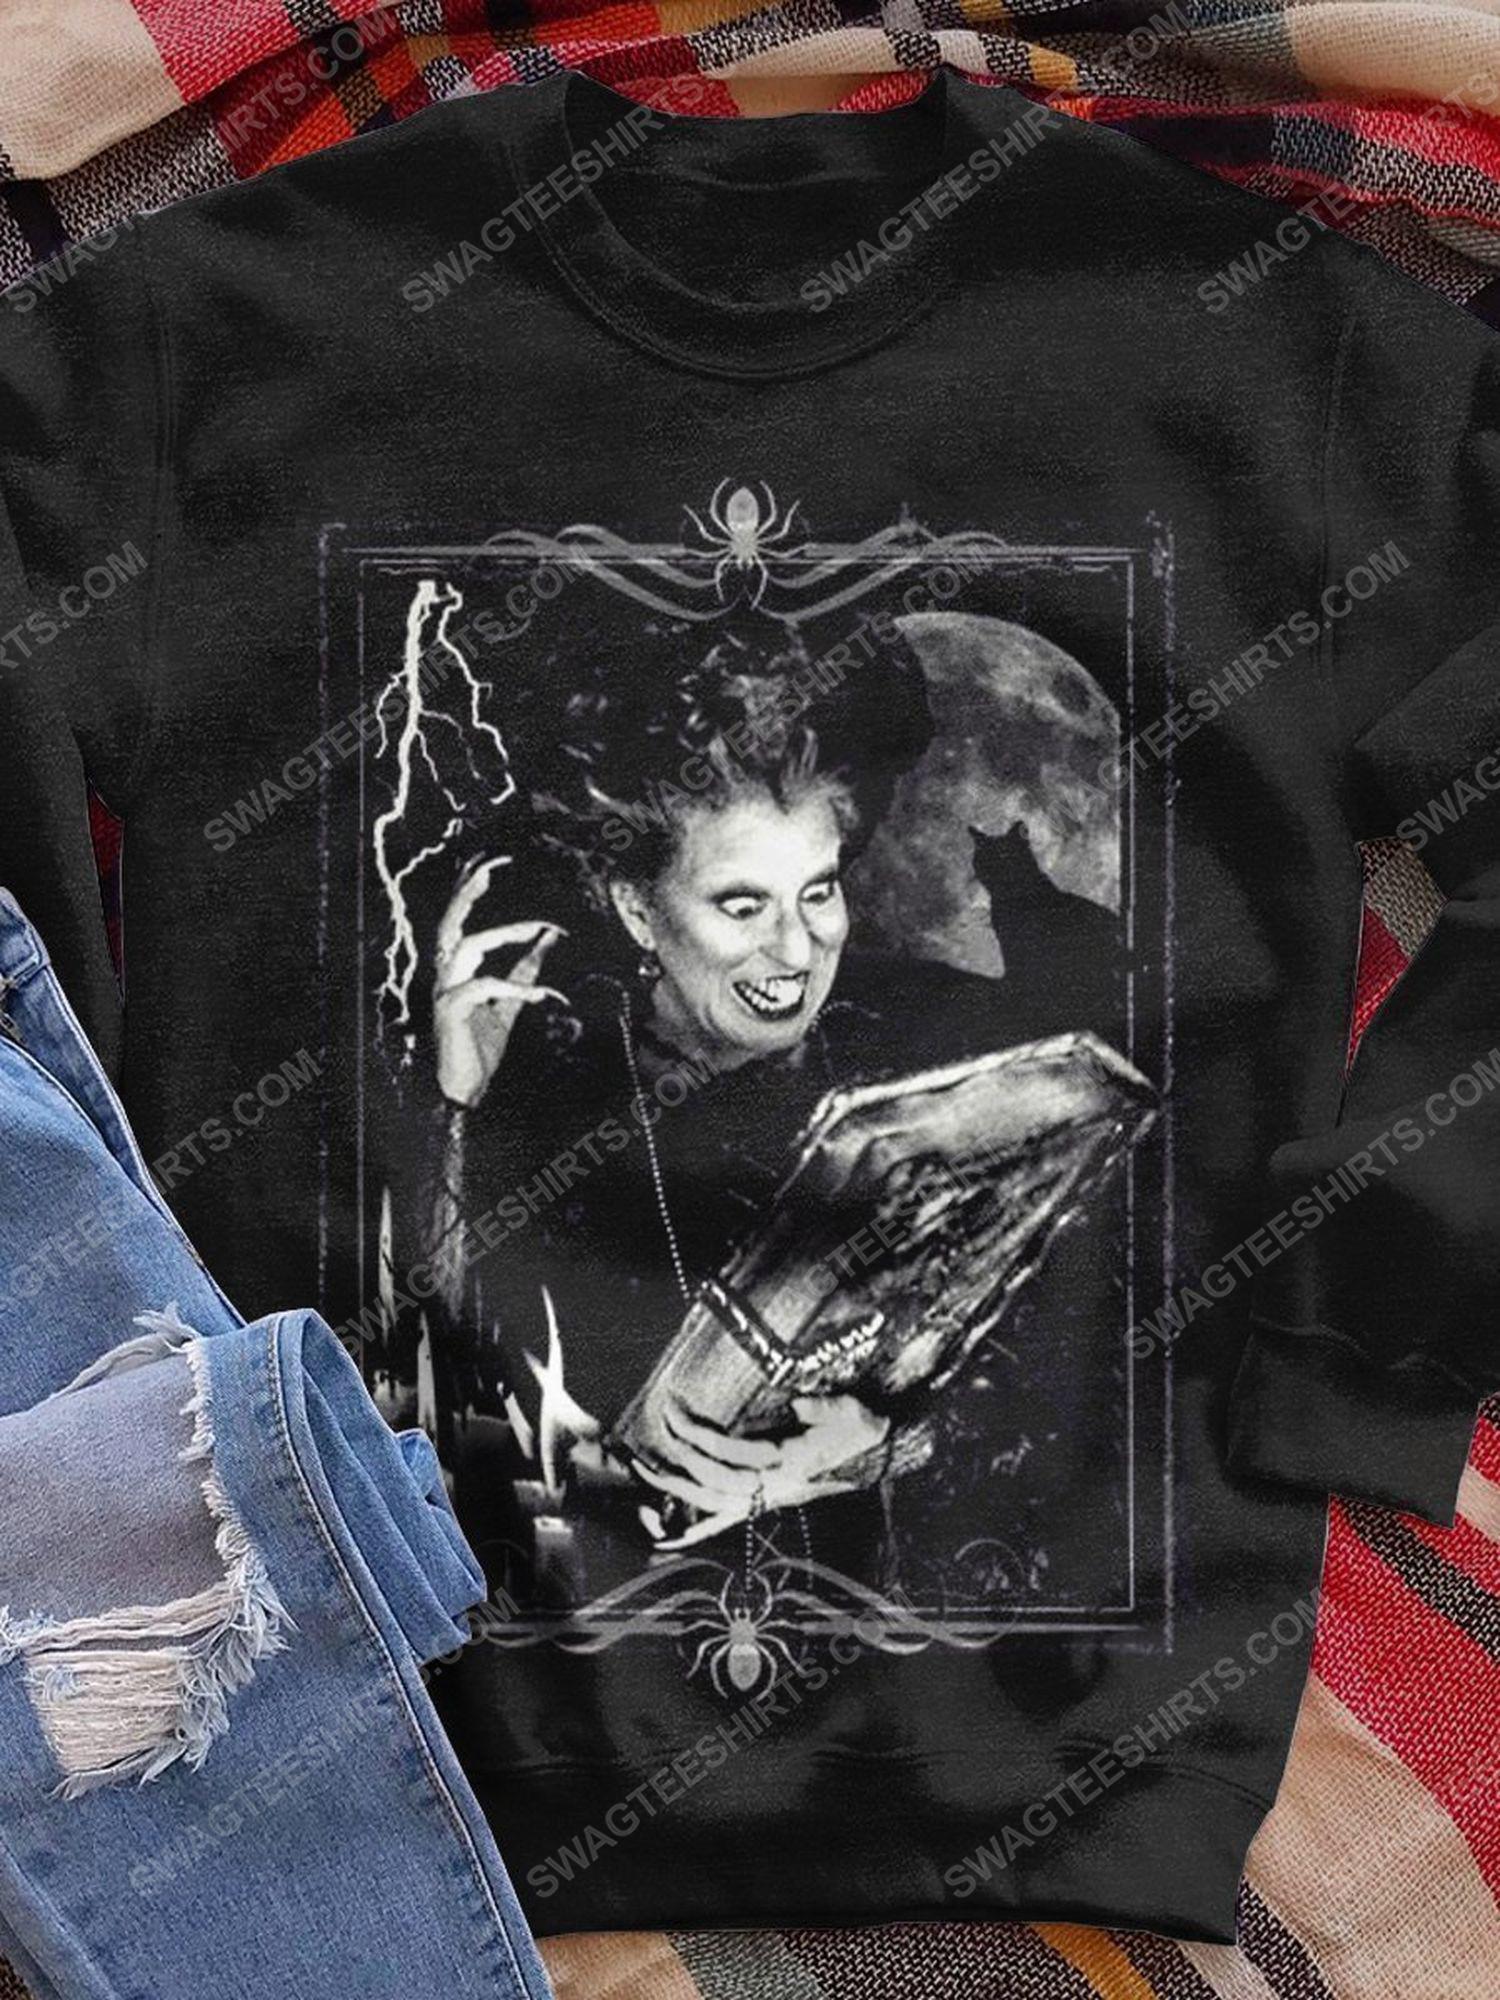 Halloween night hocus pocus witch shirt 1 - Copy (3)